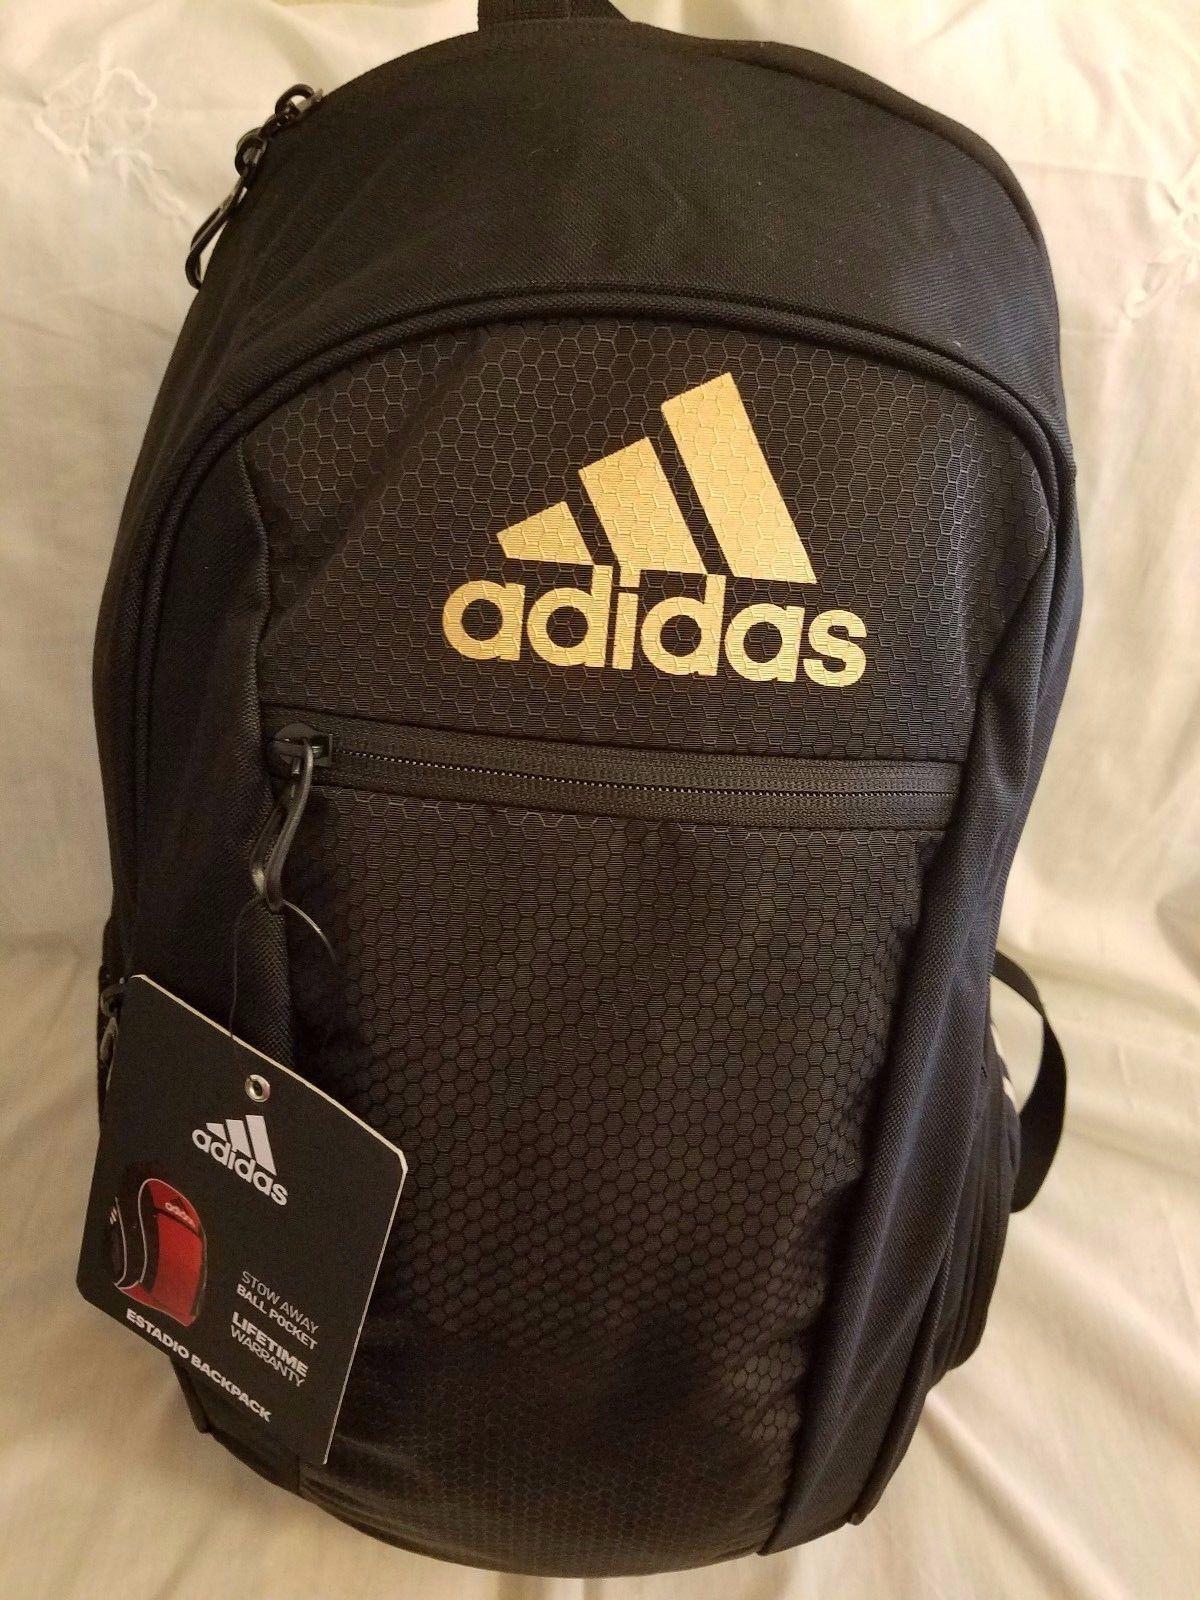 34c0e81ac6 Adidas Estadio Iv Team Backpack Ball Carrier And 15 Similar Items. Adidas  Stadium Team Backpack Black ...